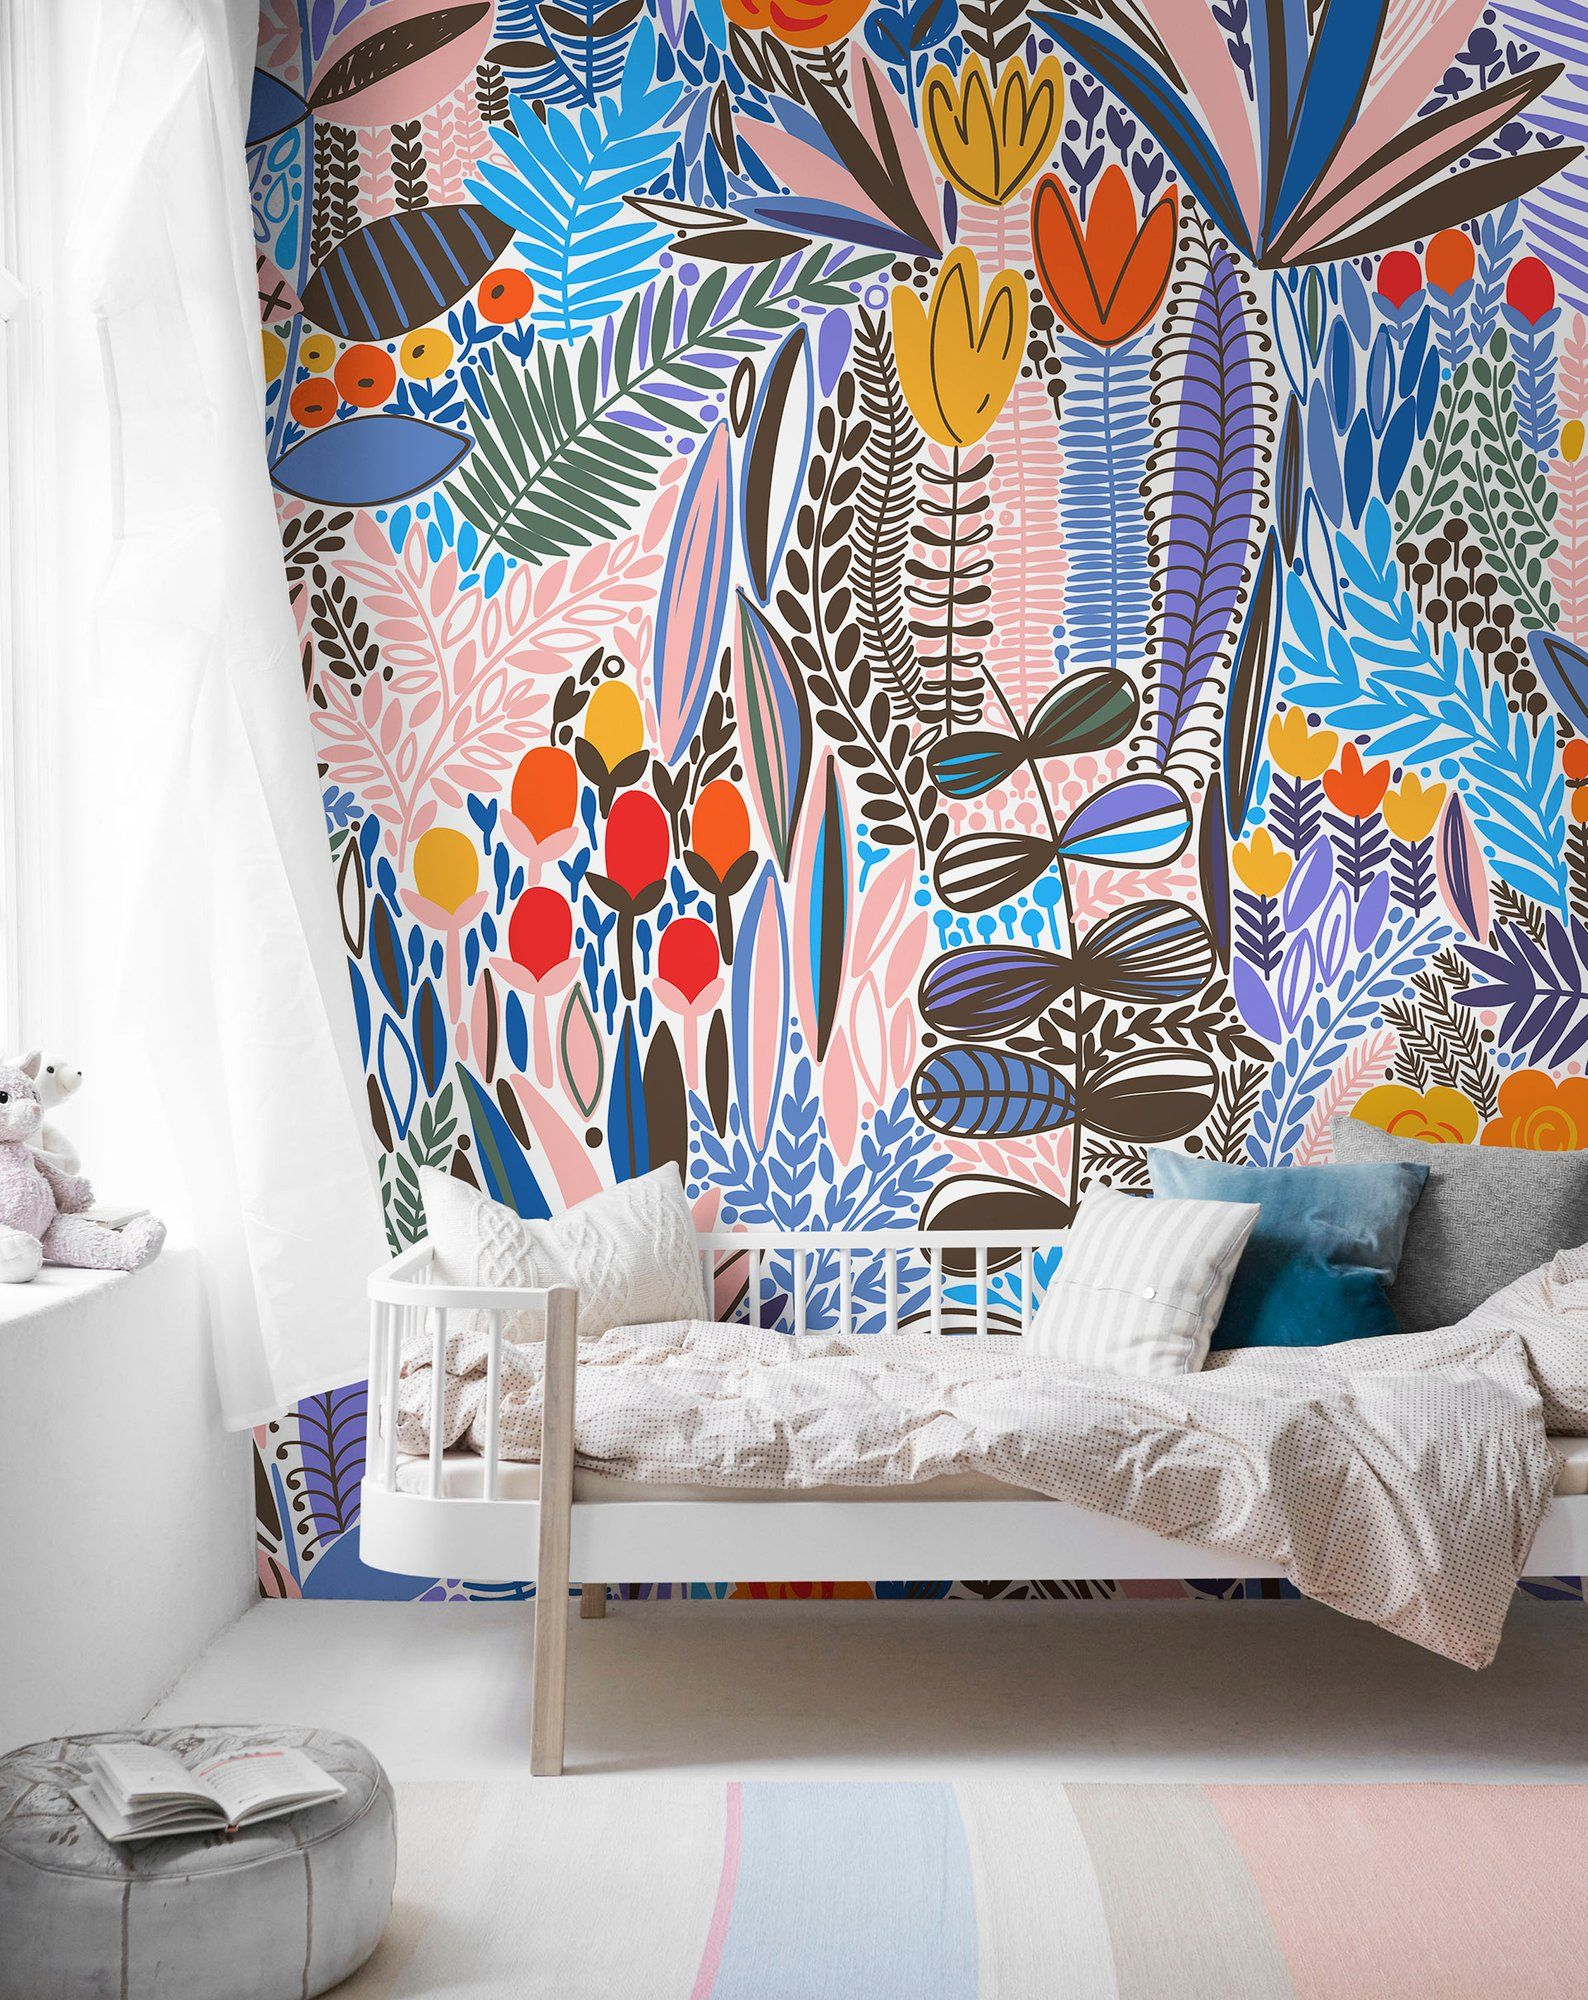 Cute Floral Wallpaper, Floral Wallpaper, Nursery Wallpaper